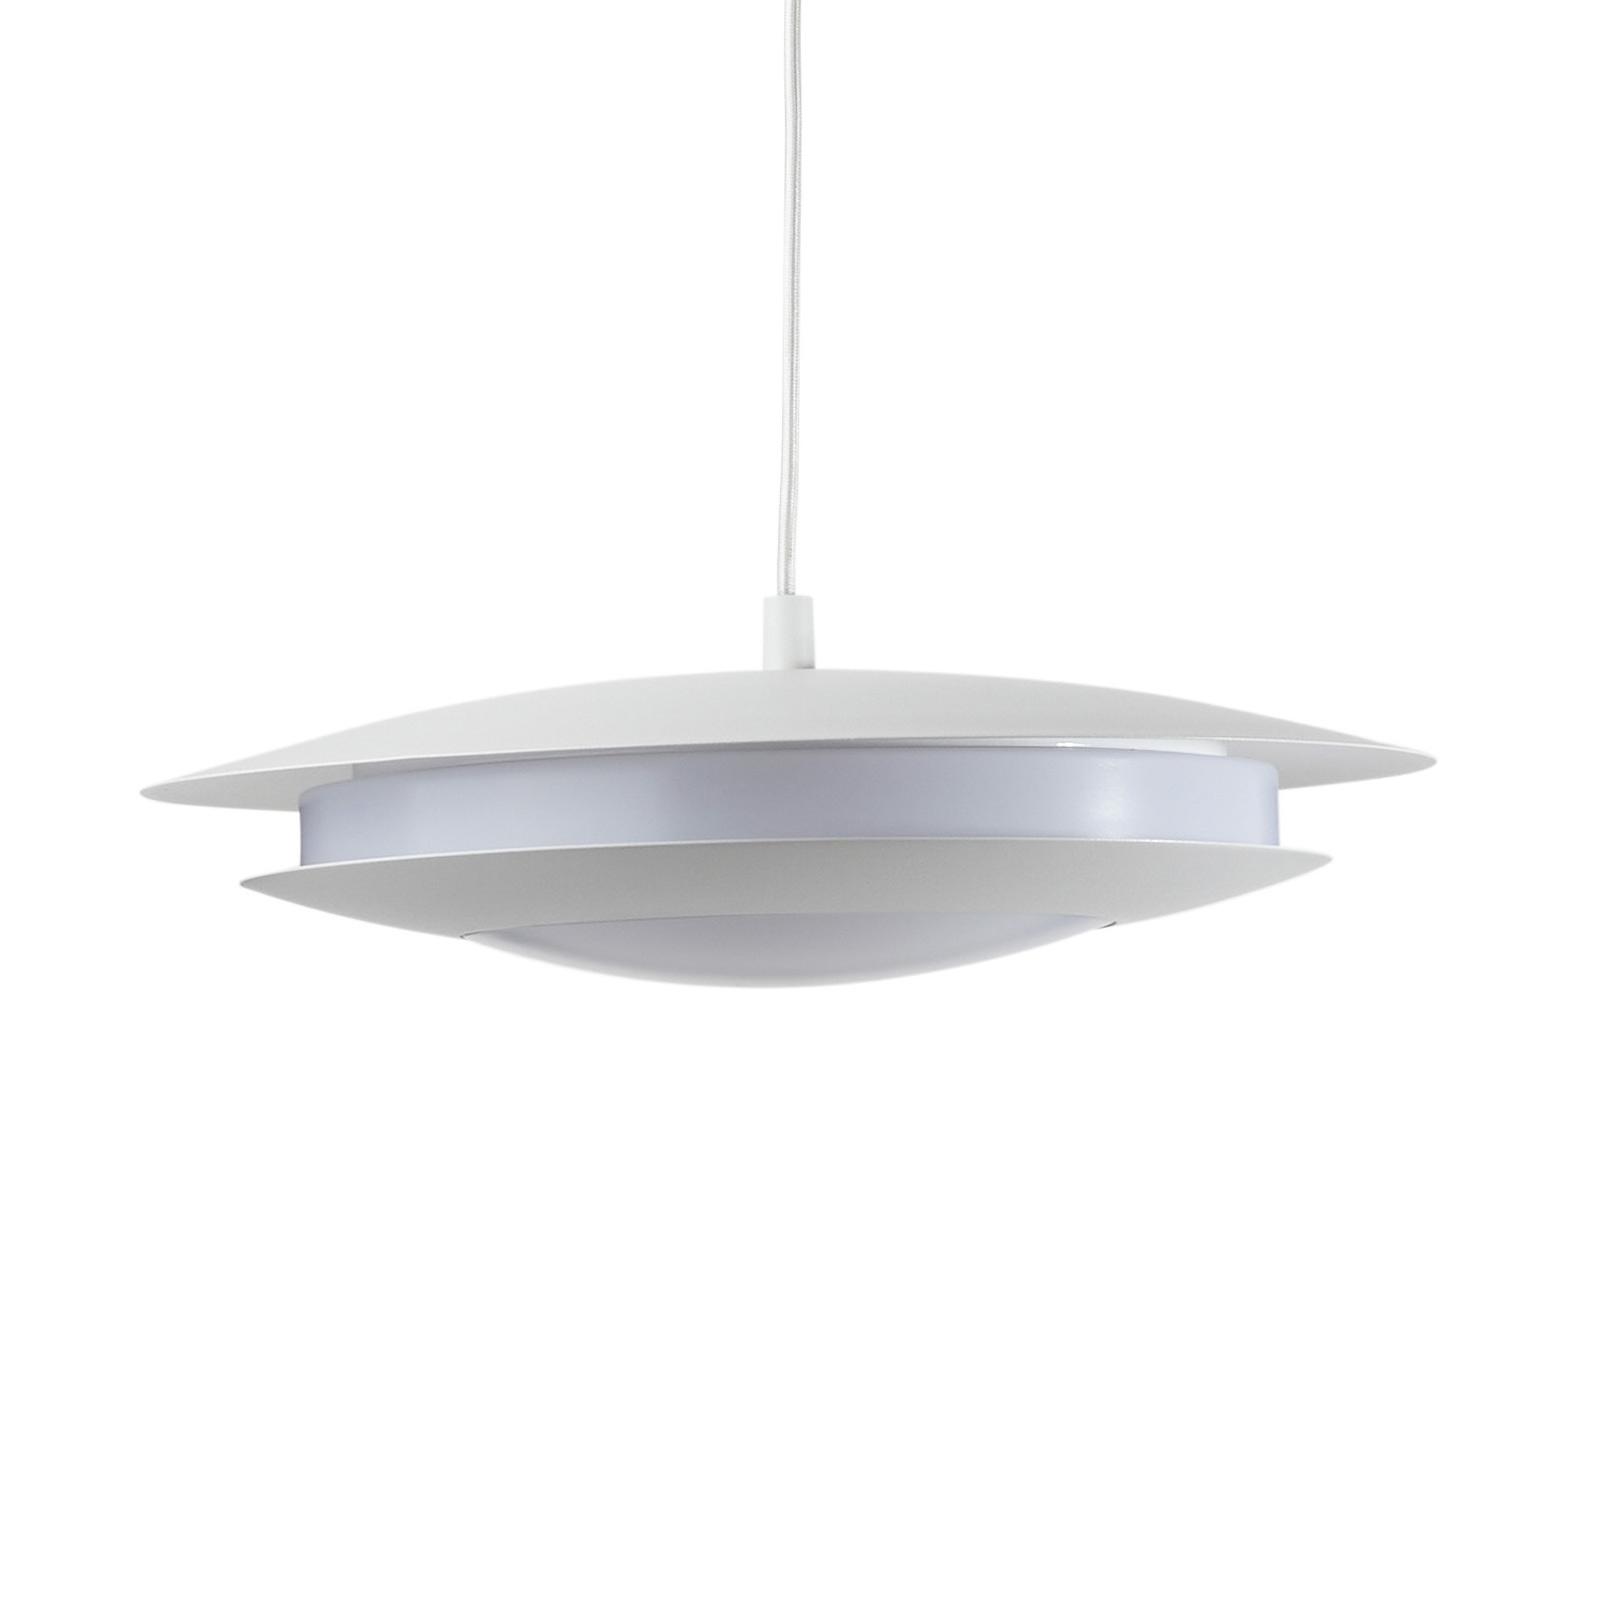 EGLO connect Moneva-C lampa wisząca biała Ø 40,5